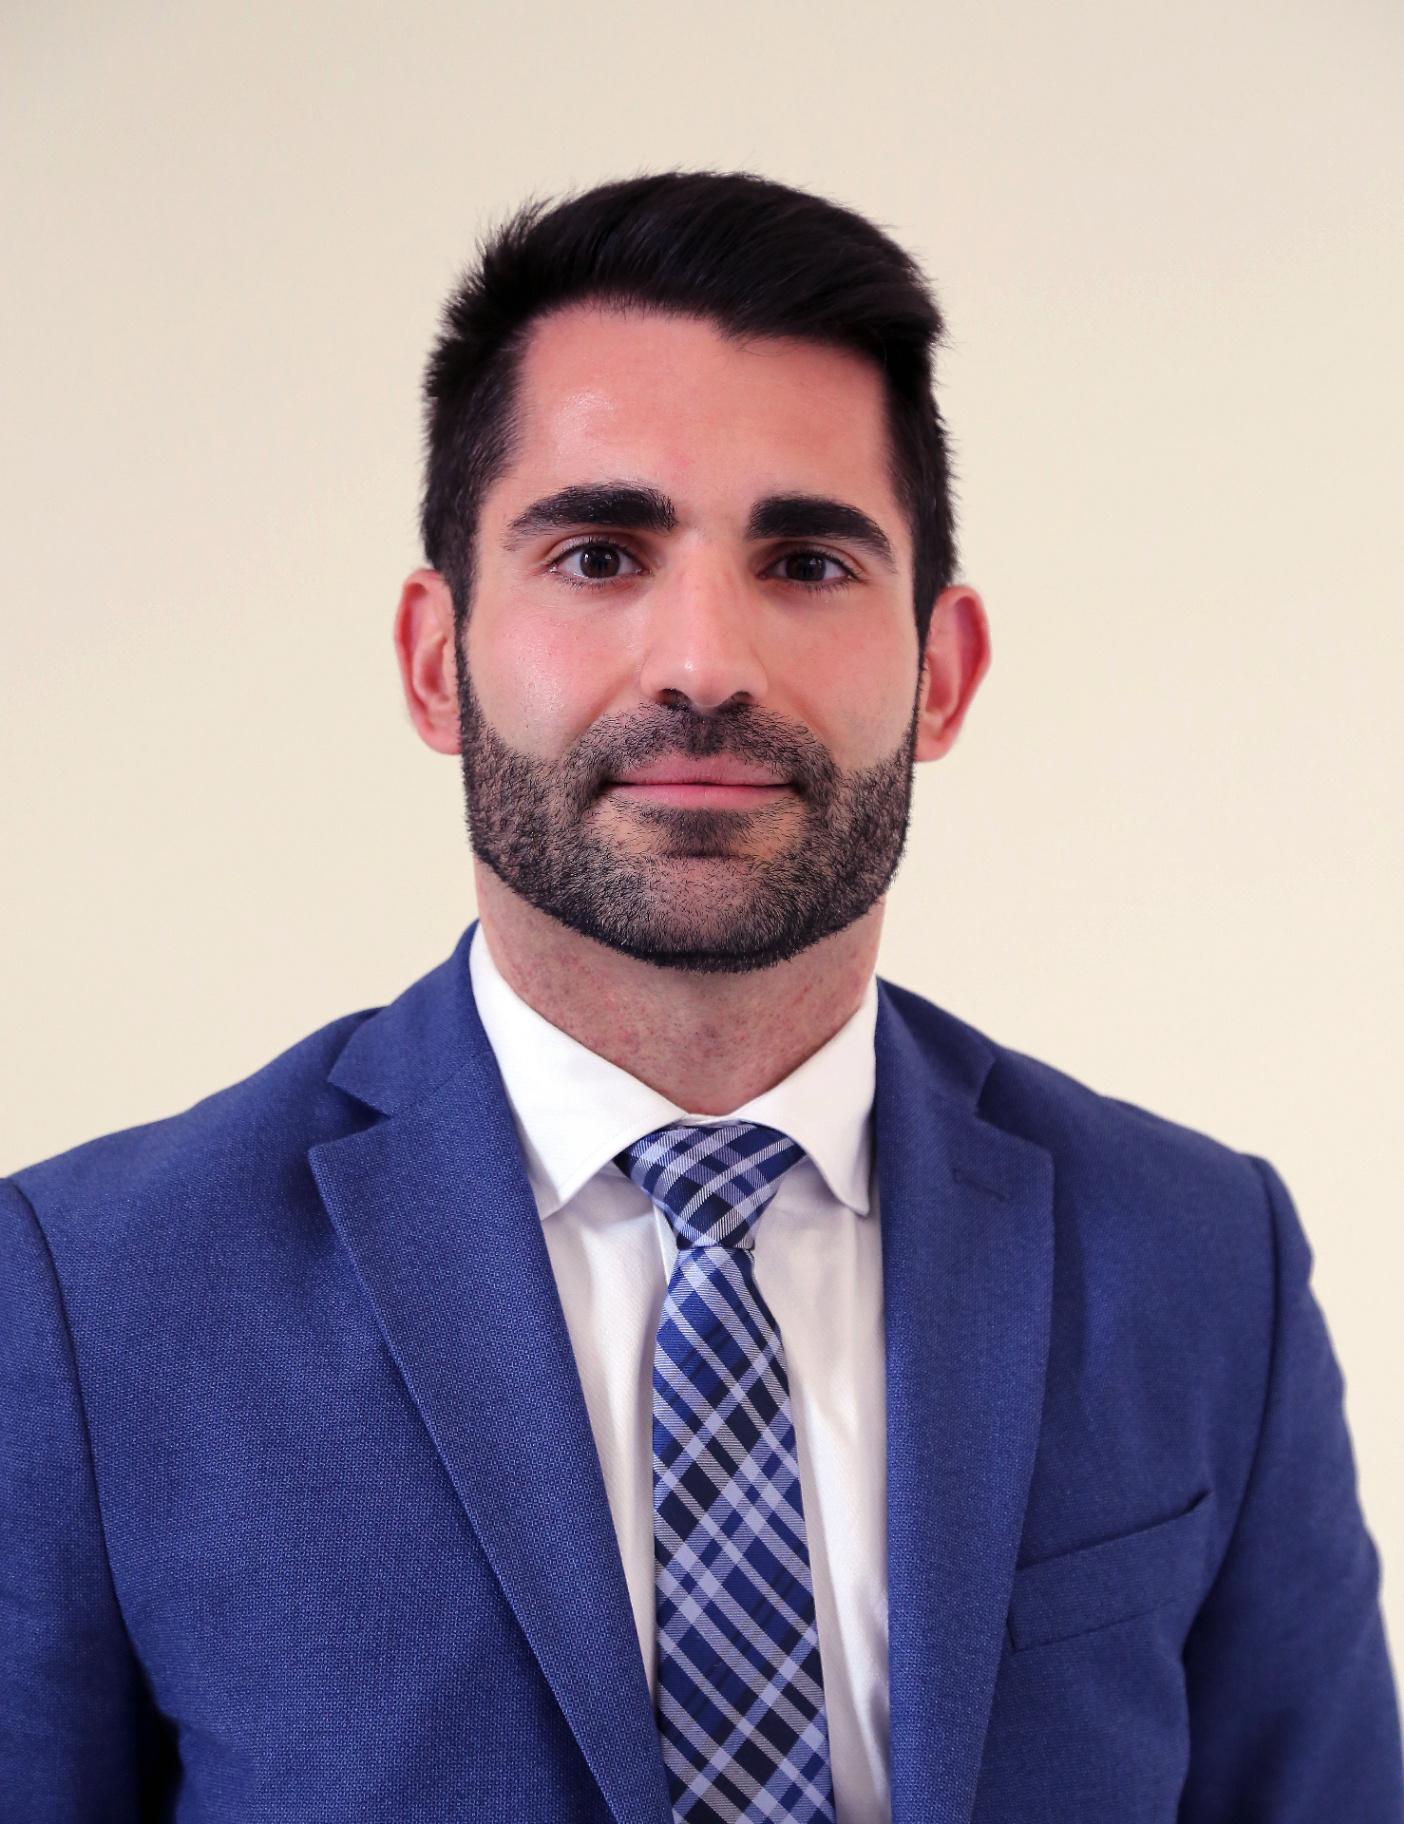 D. Eugenio Olmedo Peralta